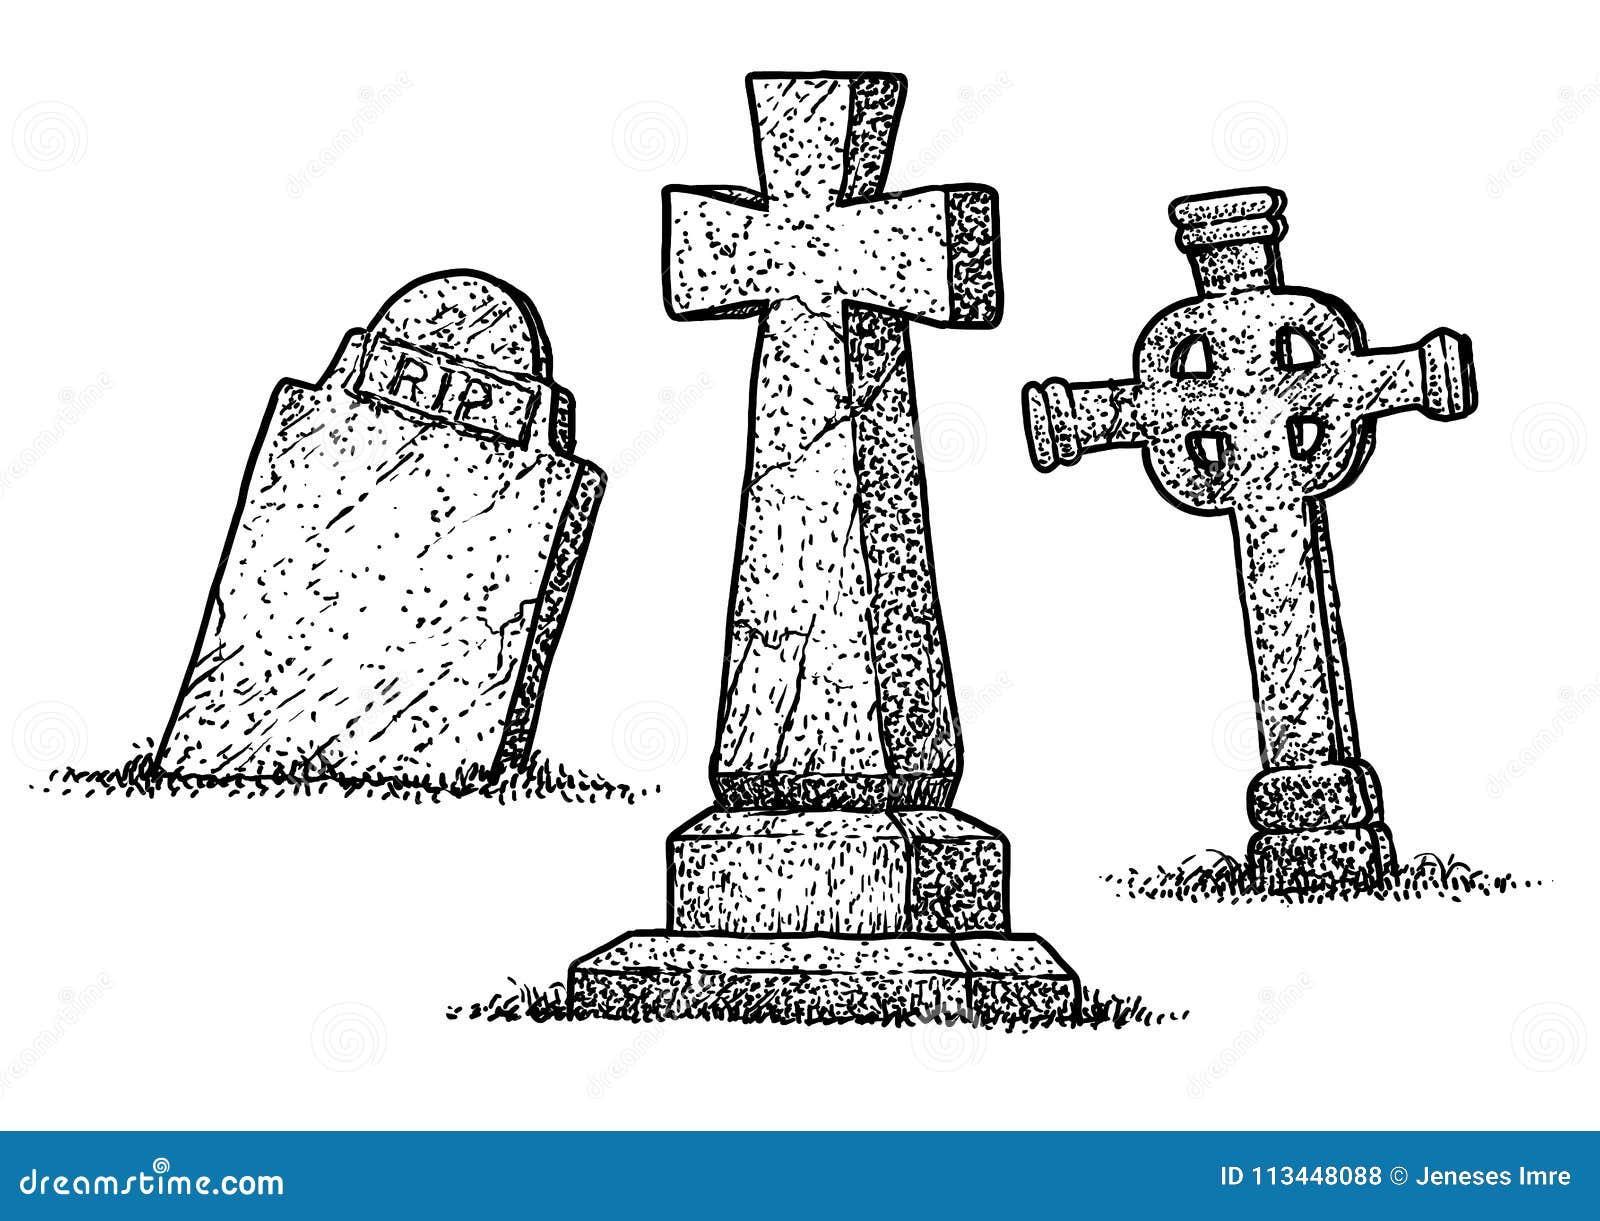 Illustration de pierre tombale dessin gravure encre sch ma vecteur illustration de vecteur - Pierre tombale dessin ...